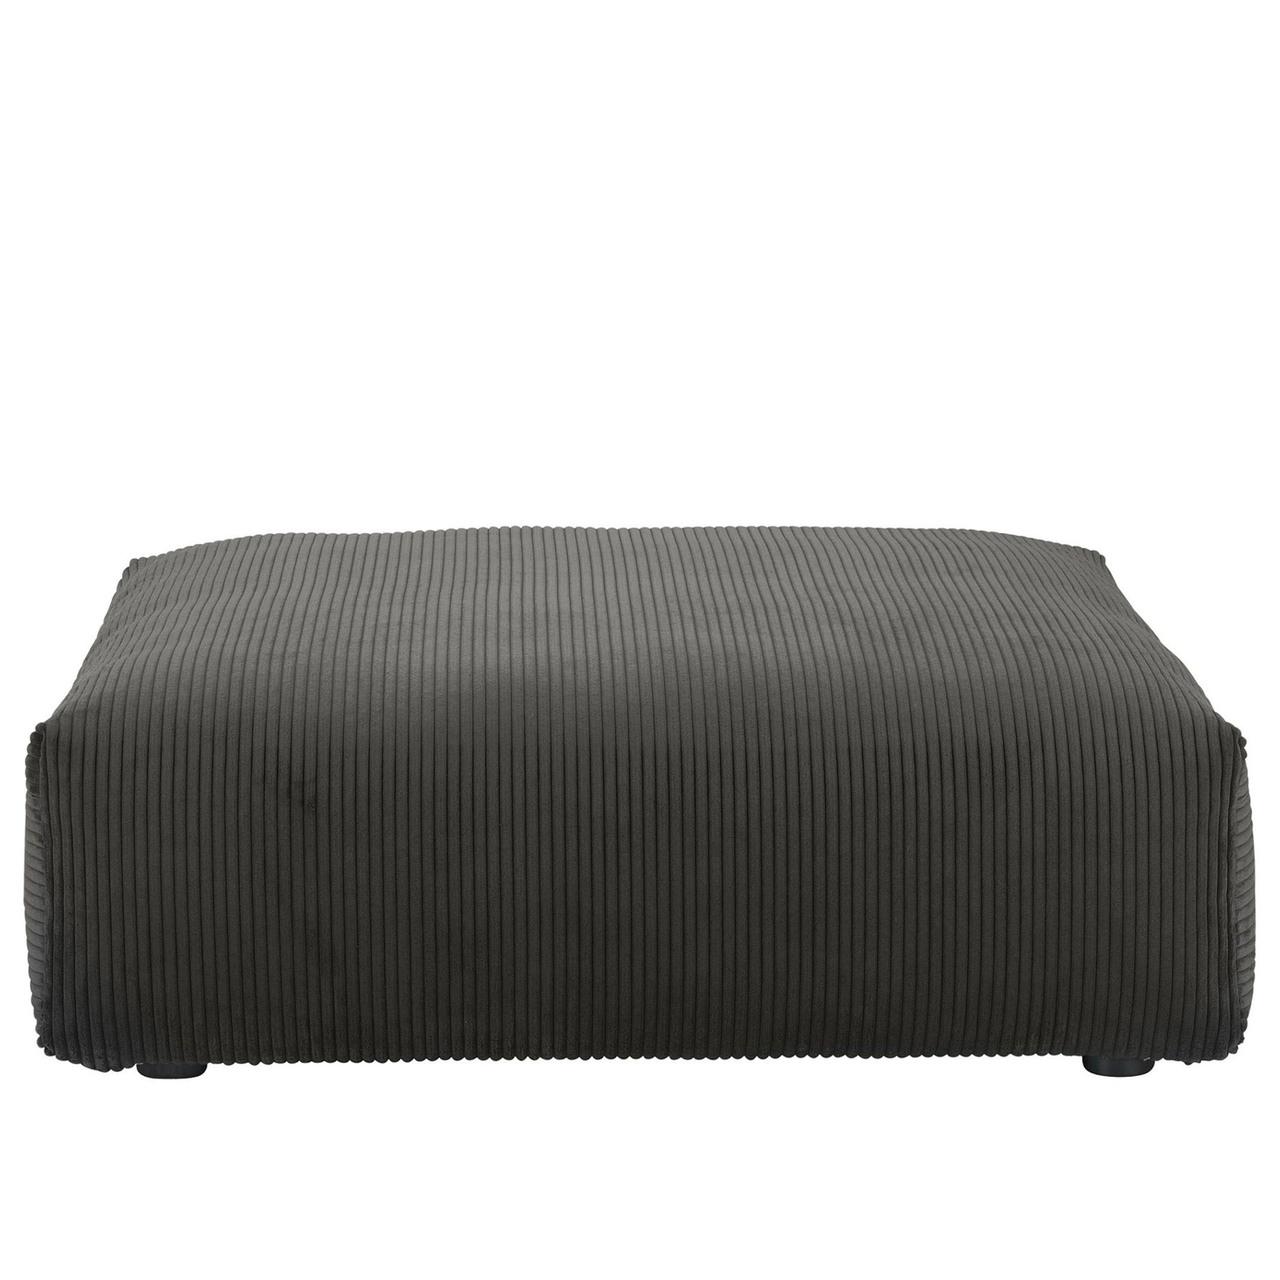 Vetsak Sofa Seat Large Cord Velour - Dunkelgrau